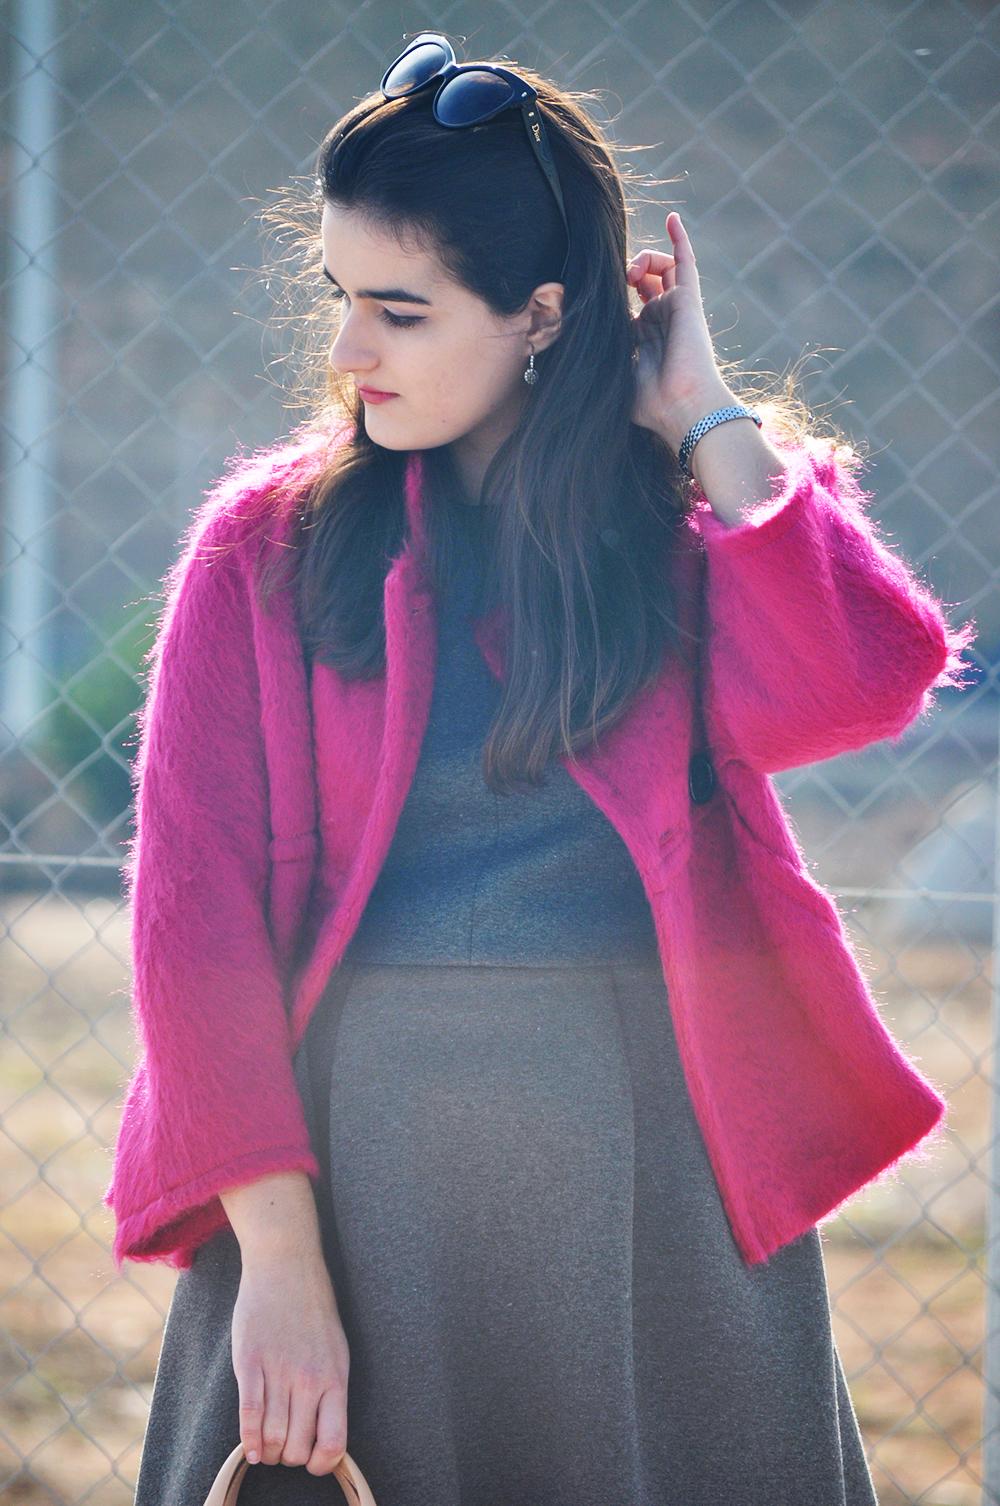 something fashion blogger valencia spain pink maxmara coat vintage carolina herrera andy seven bag small pink, leather CH bag fashion amanda r.